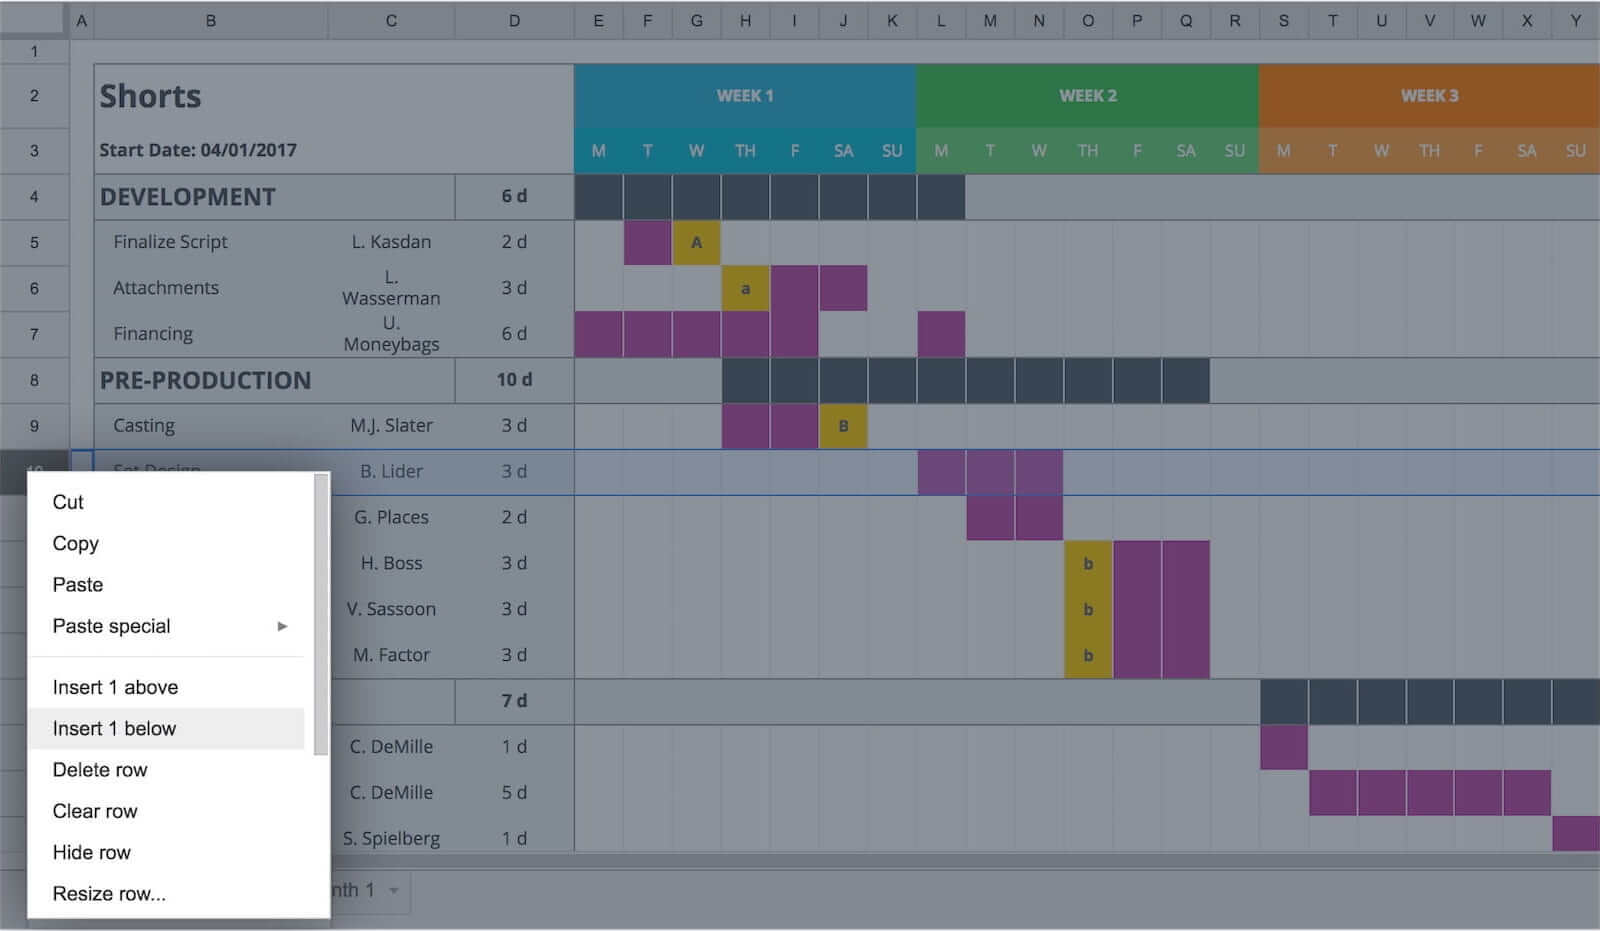 Free Gantt Chart Excel Template - Right-Click Option - StudioBinder